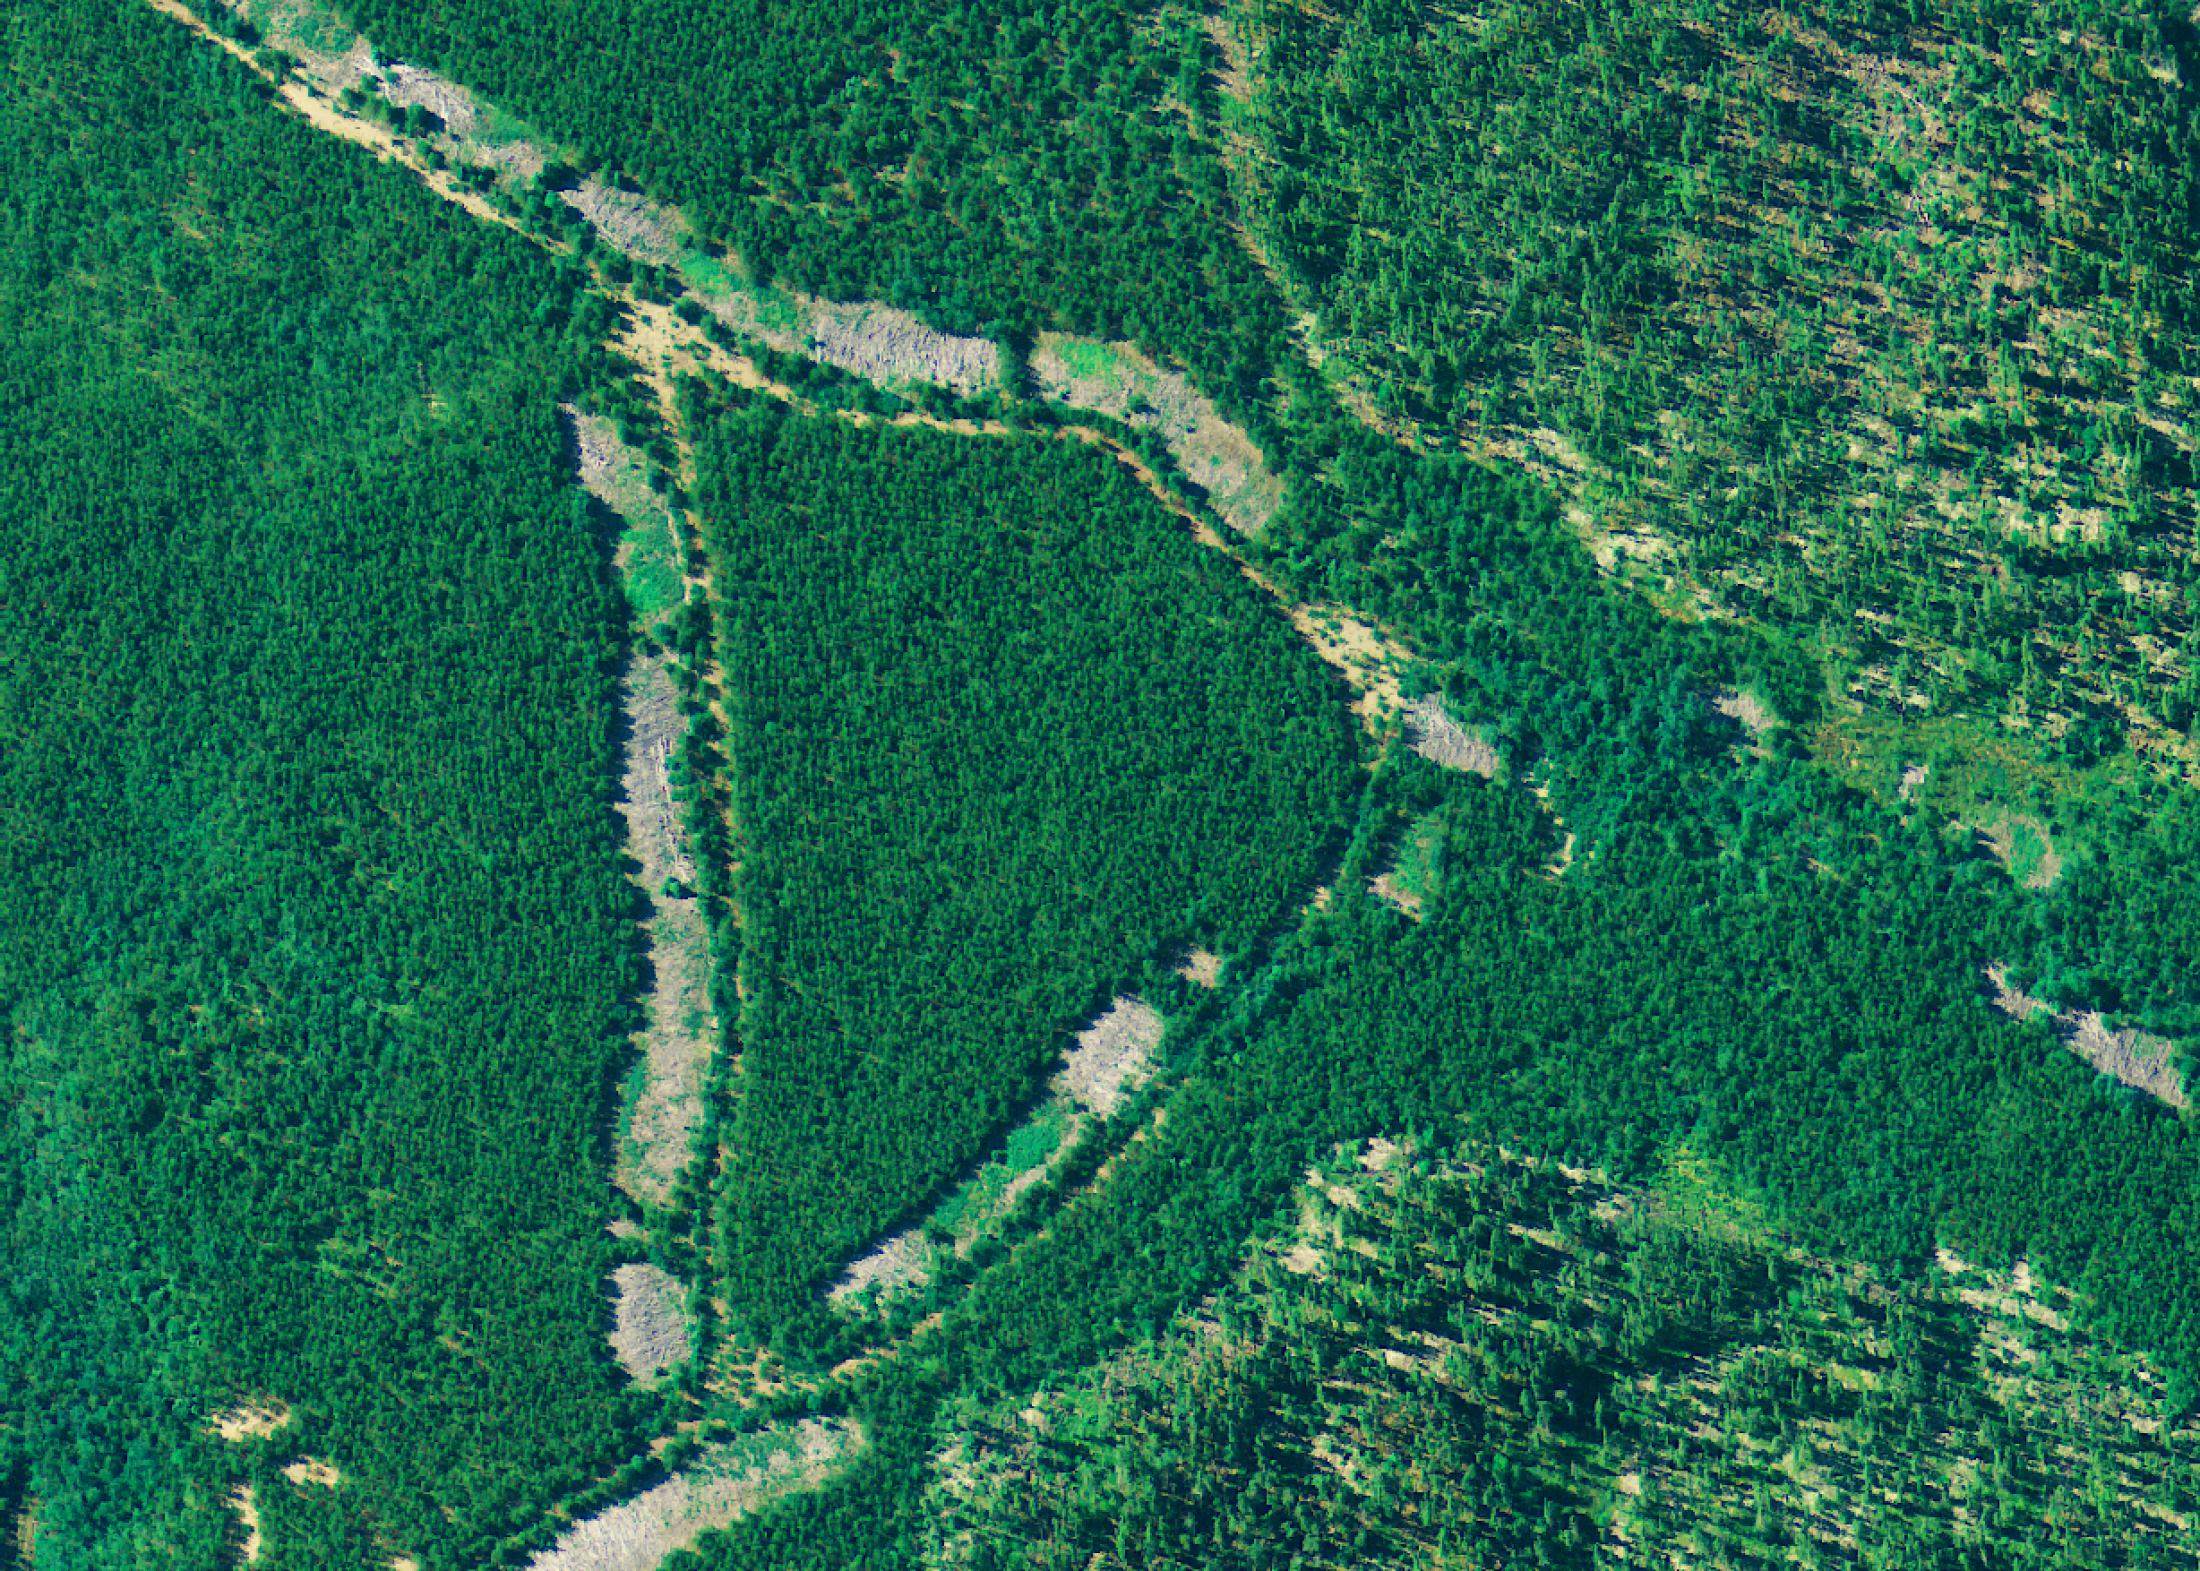 aerial-logging-scars-hesselink-image-1-e1575445871186